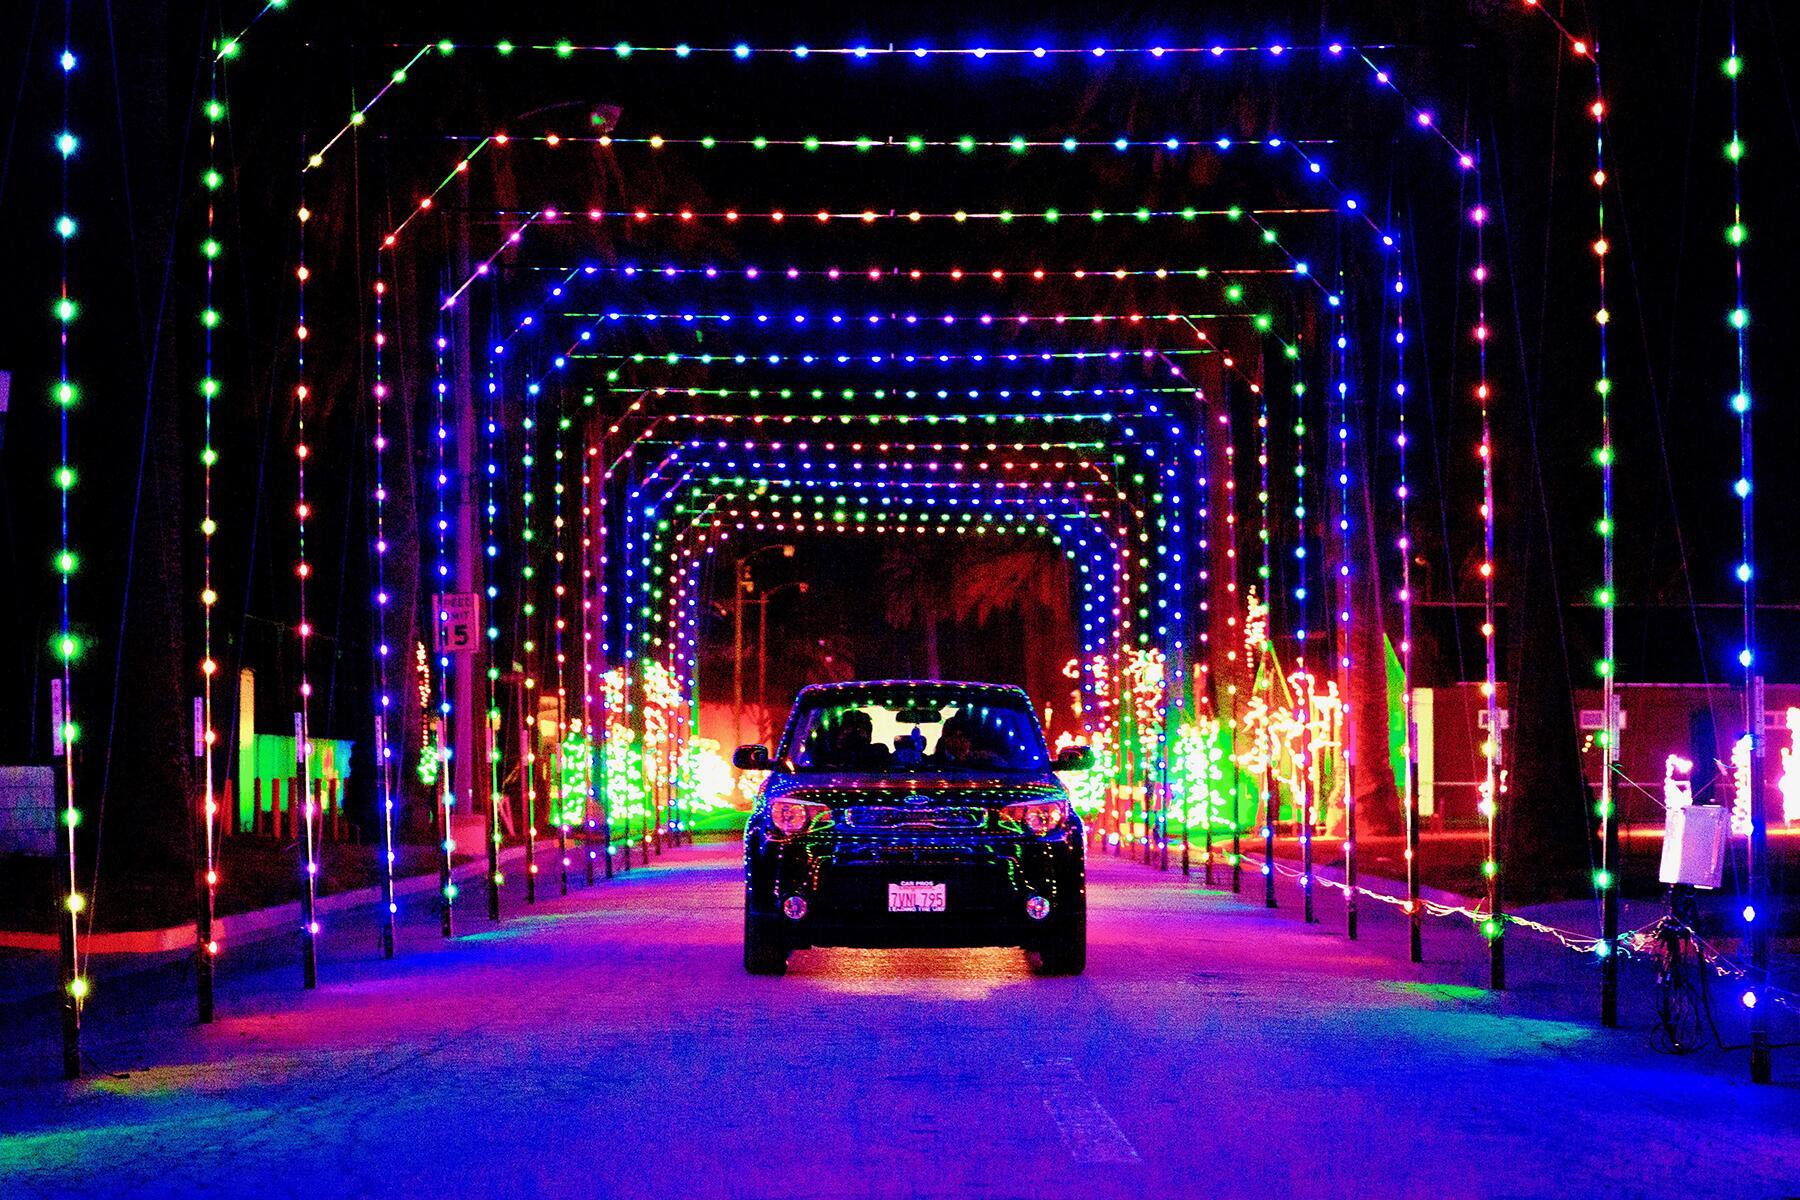 Drive Thru Christmas Lights 2021 12 Drive Thru Christmas Light Festivals Perfect For Celebrating A Socially Distant Holiday